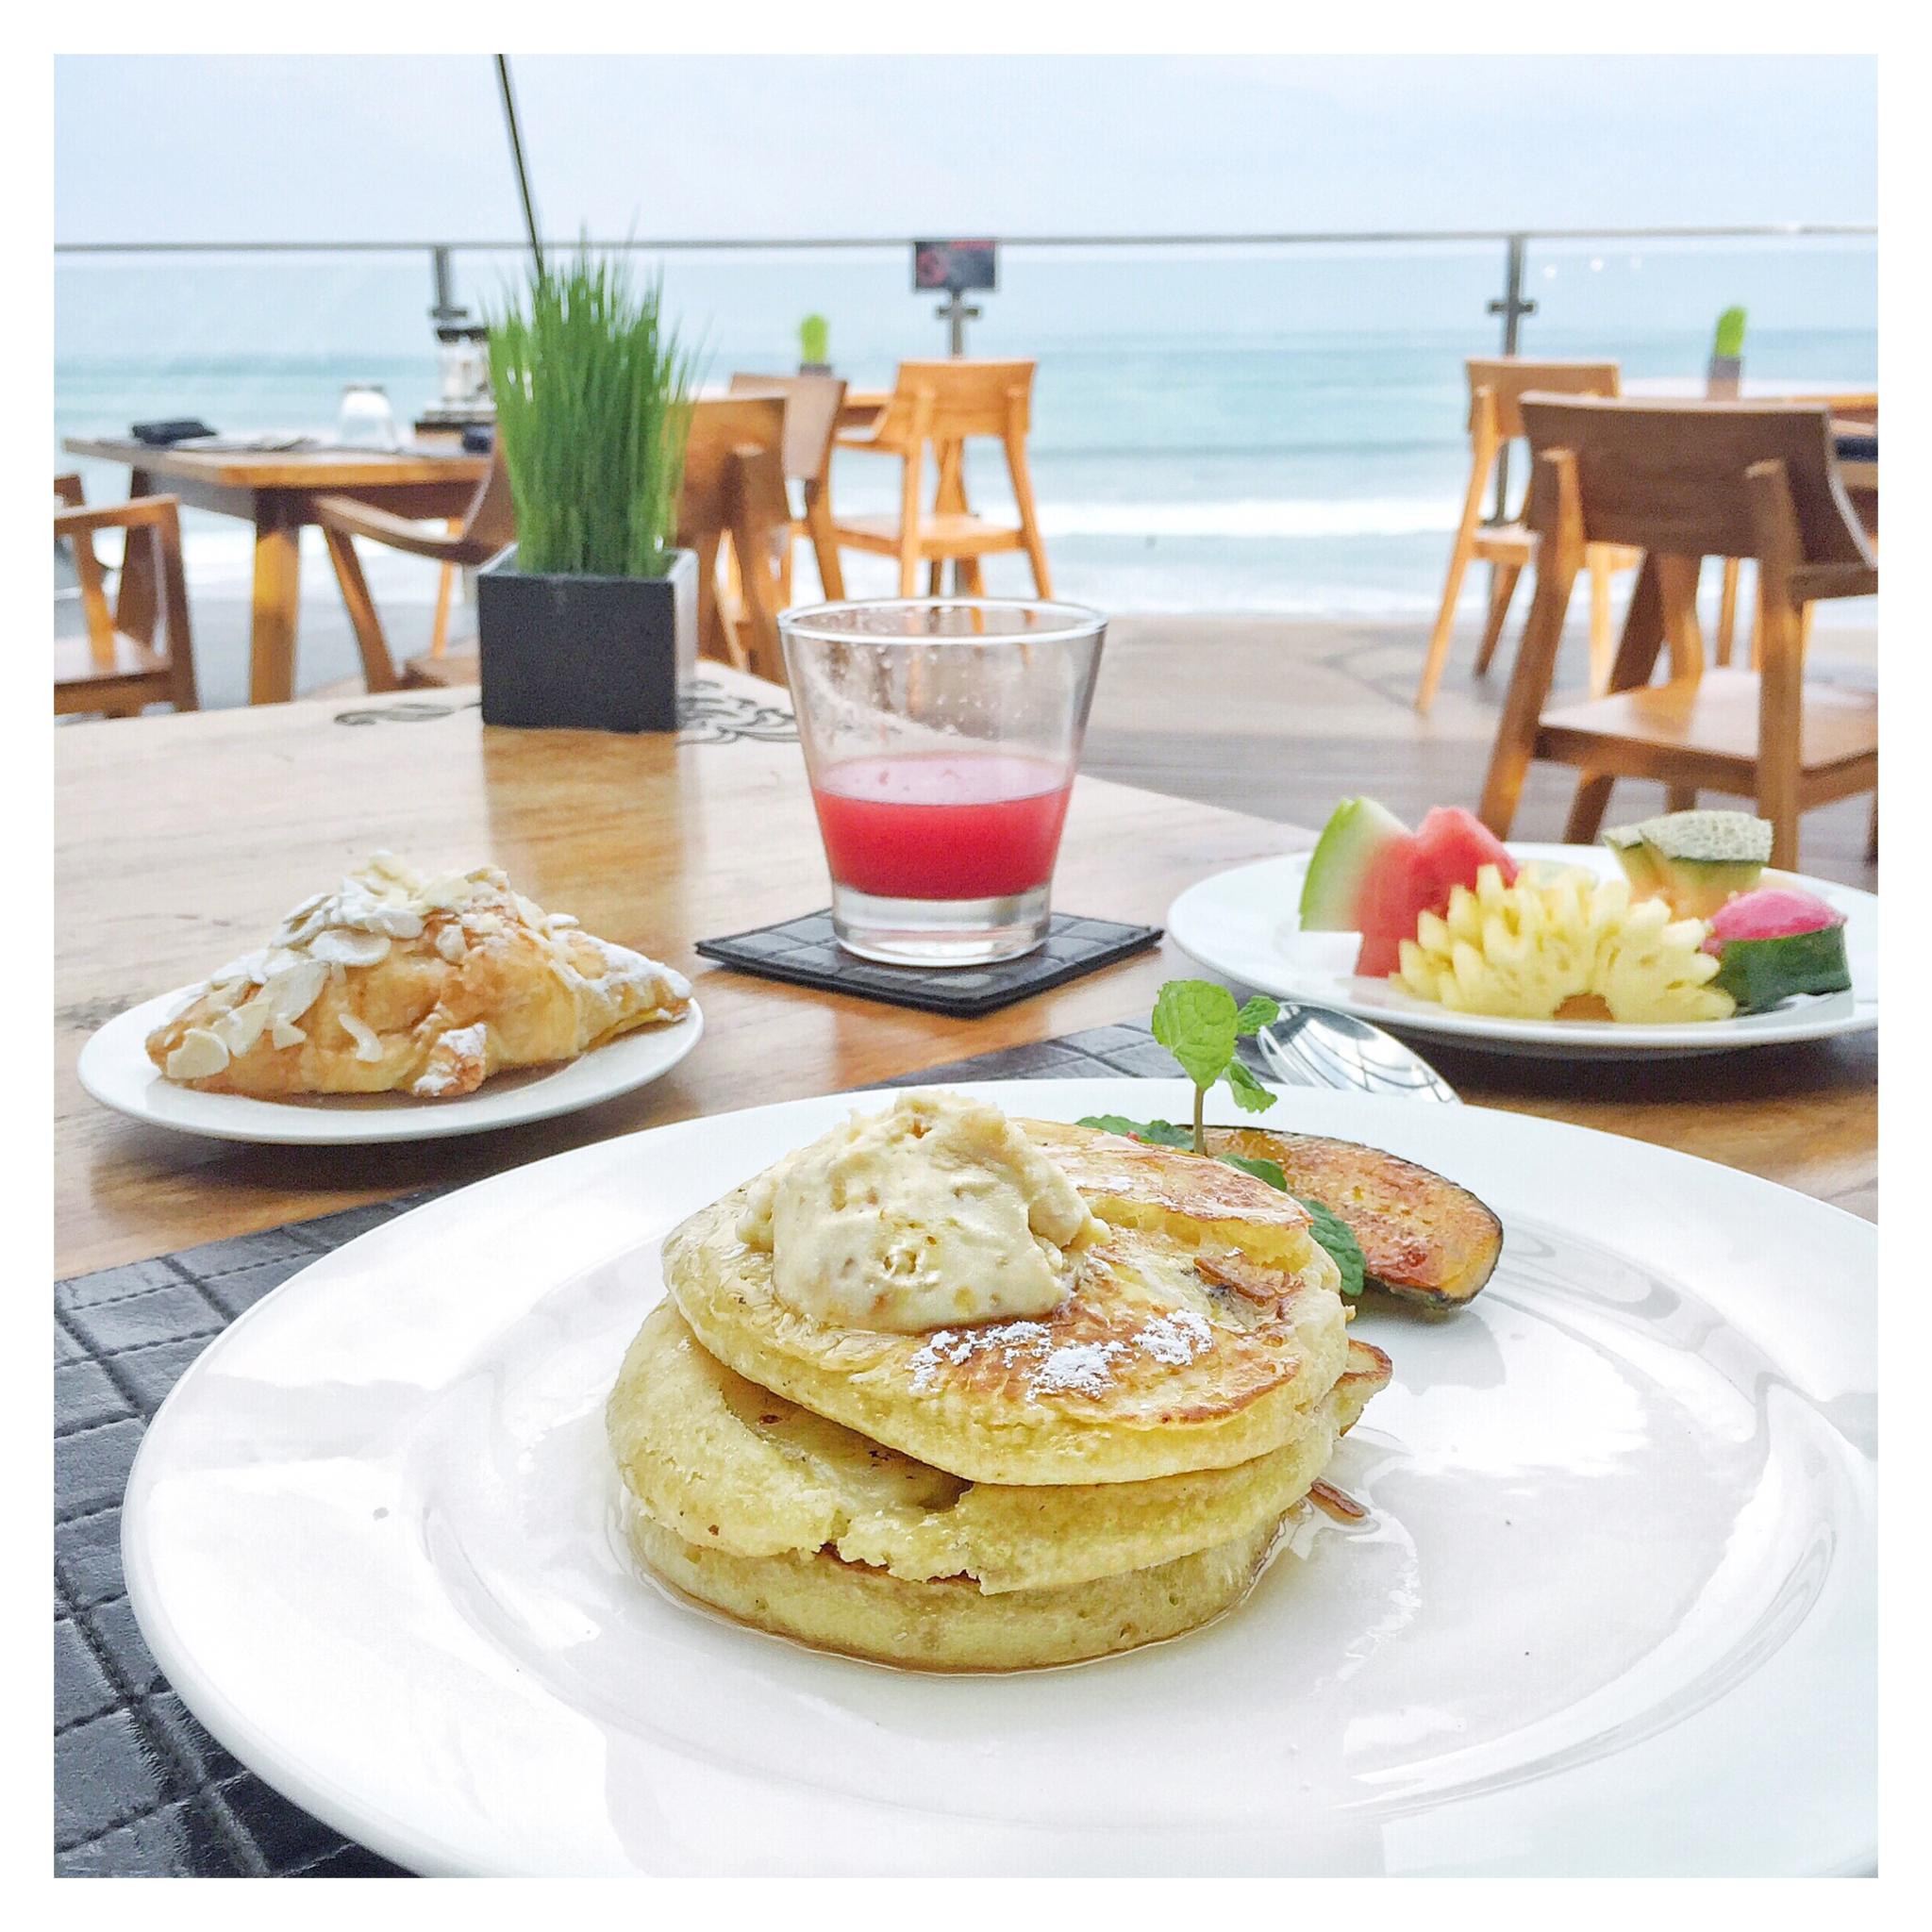 Montags-Update #55: Liebste Bali-Grüße!